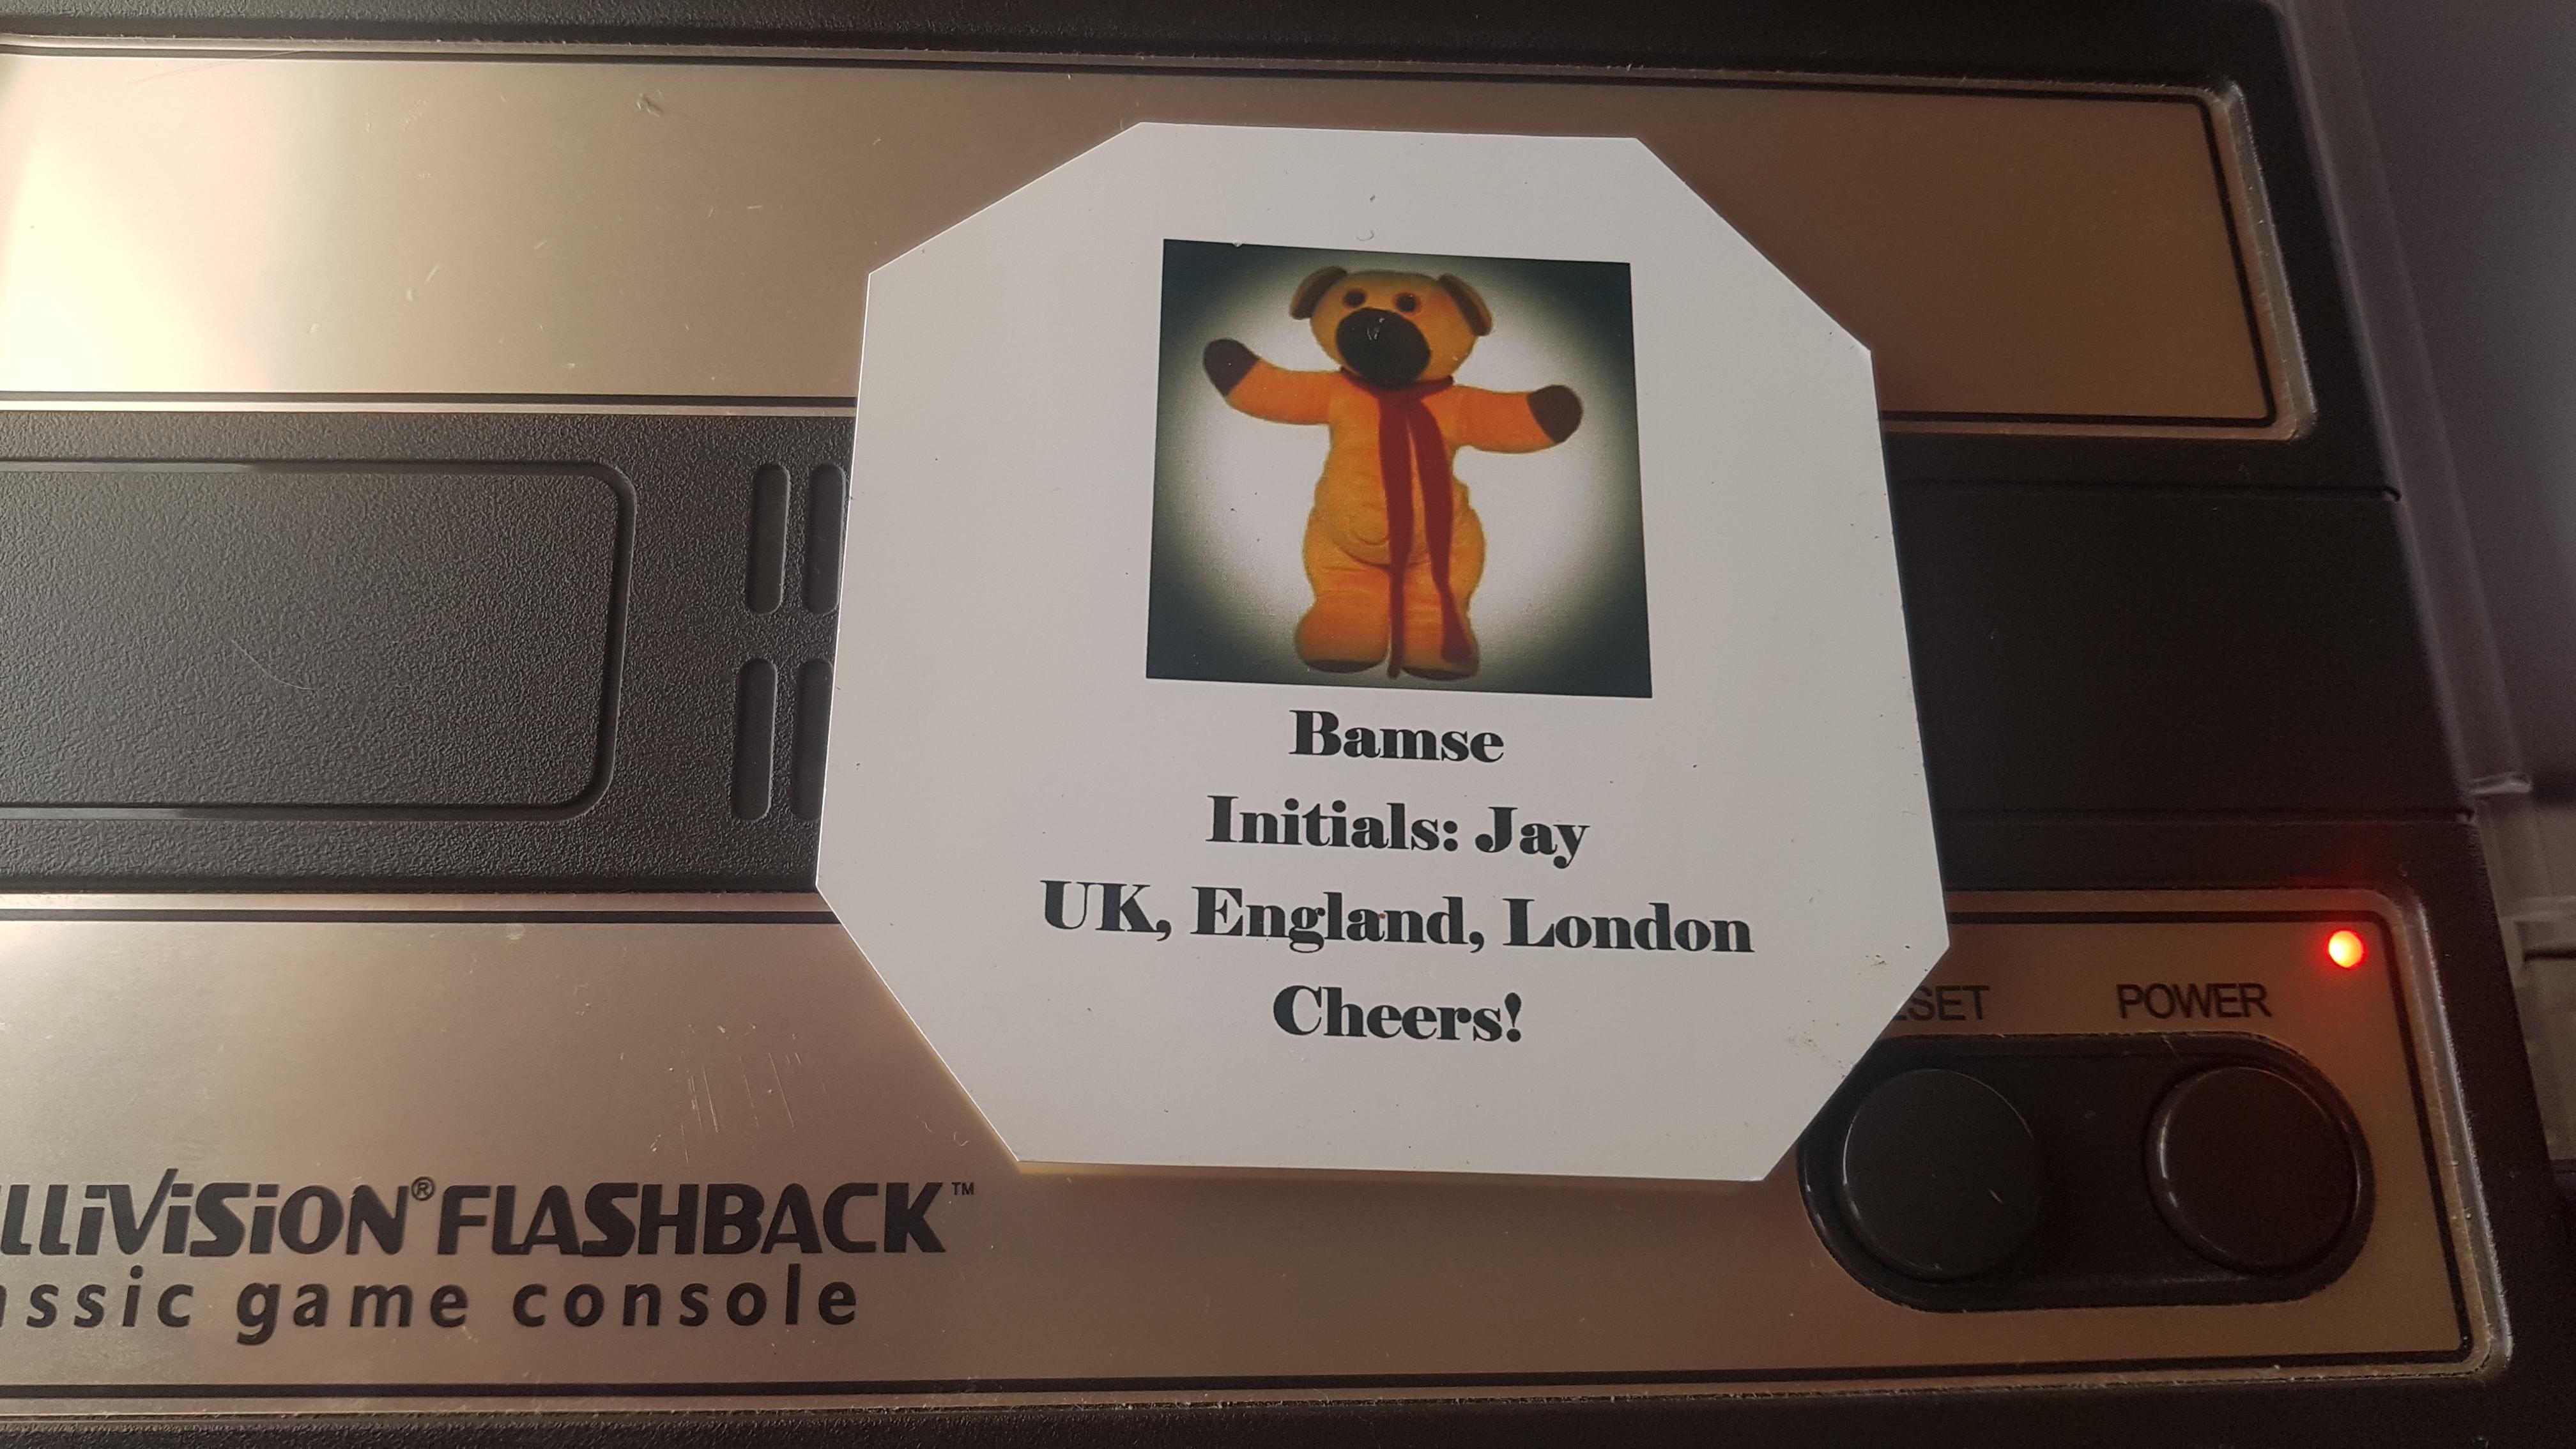 Bamse: Brickout (Intellivision Flashback) 638 points on 2019-02-14 07:24:35